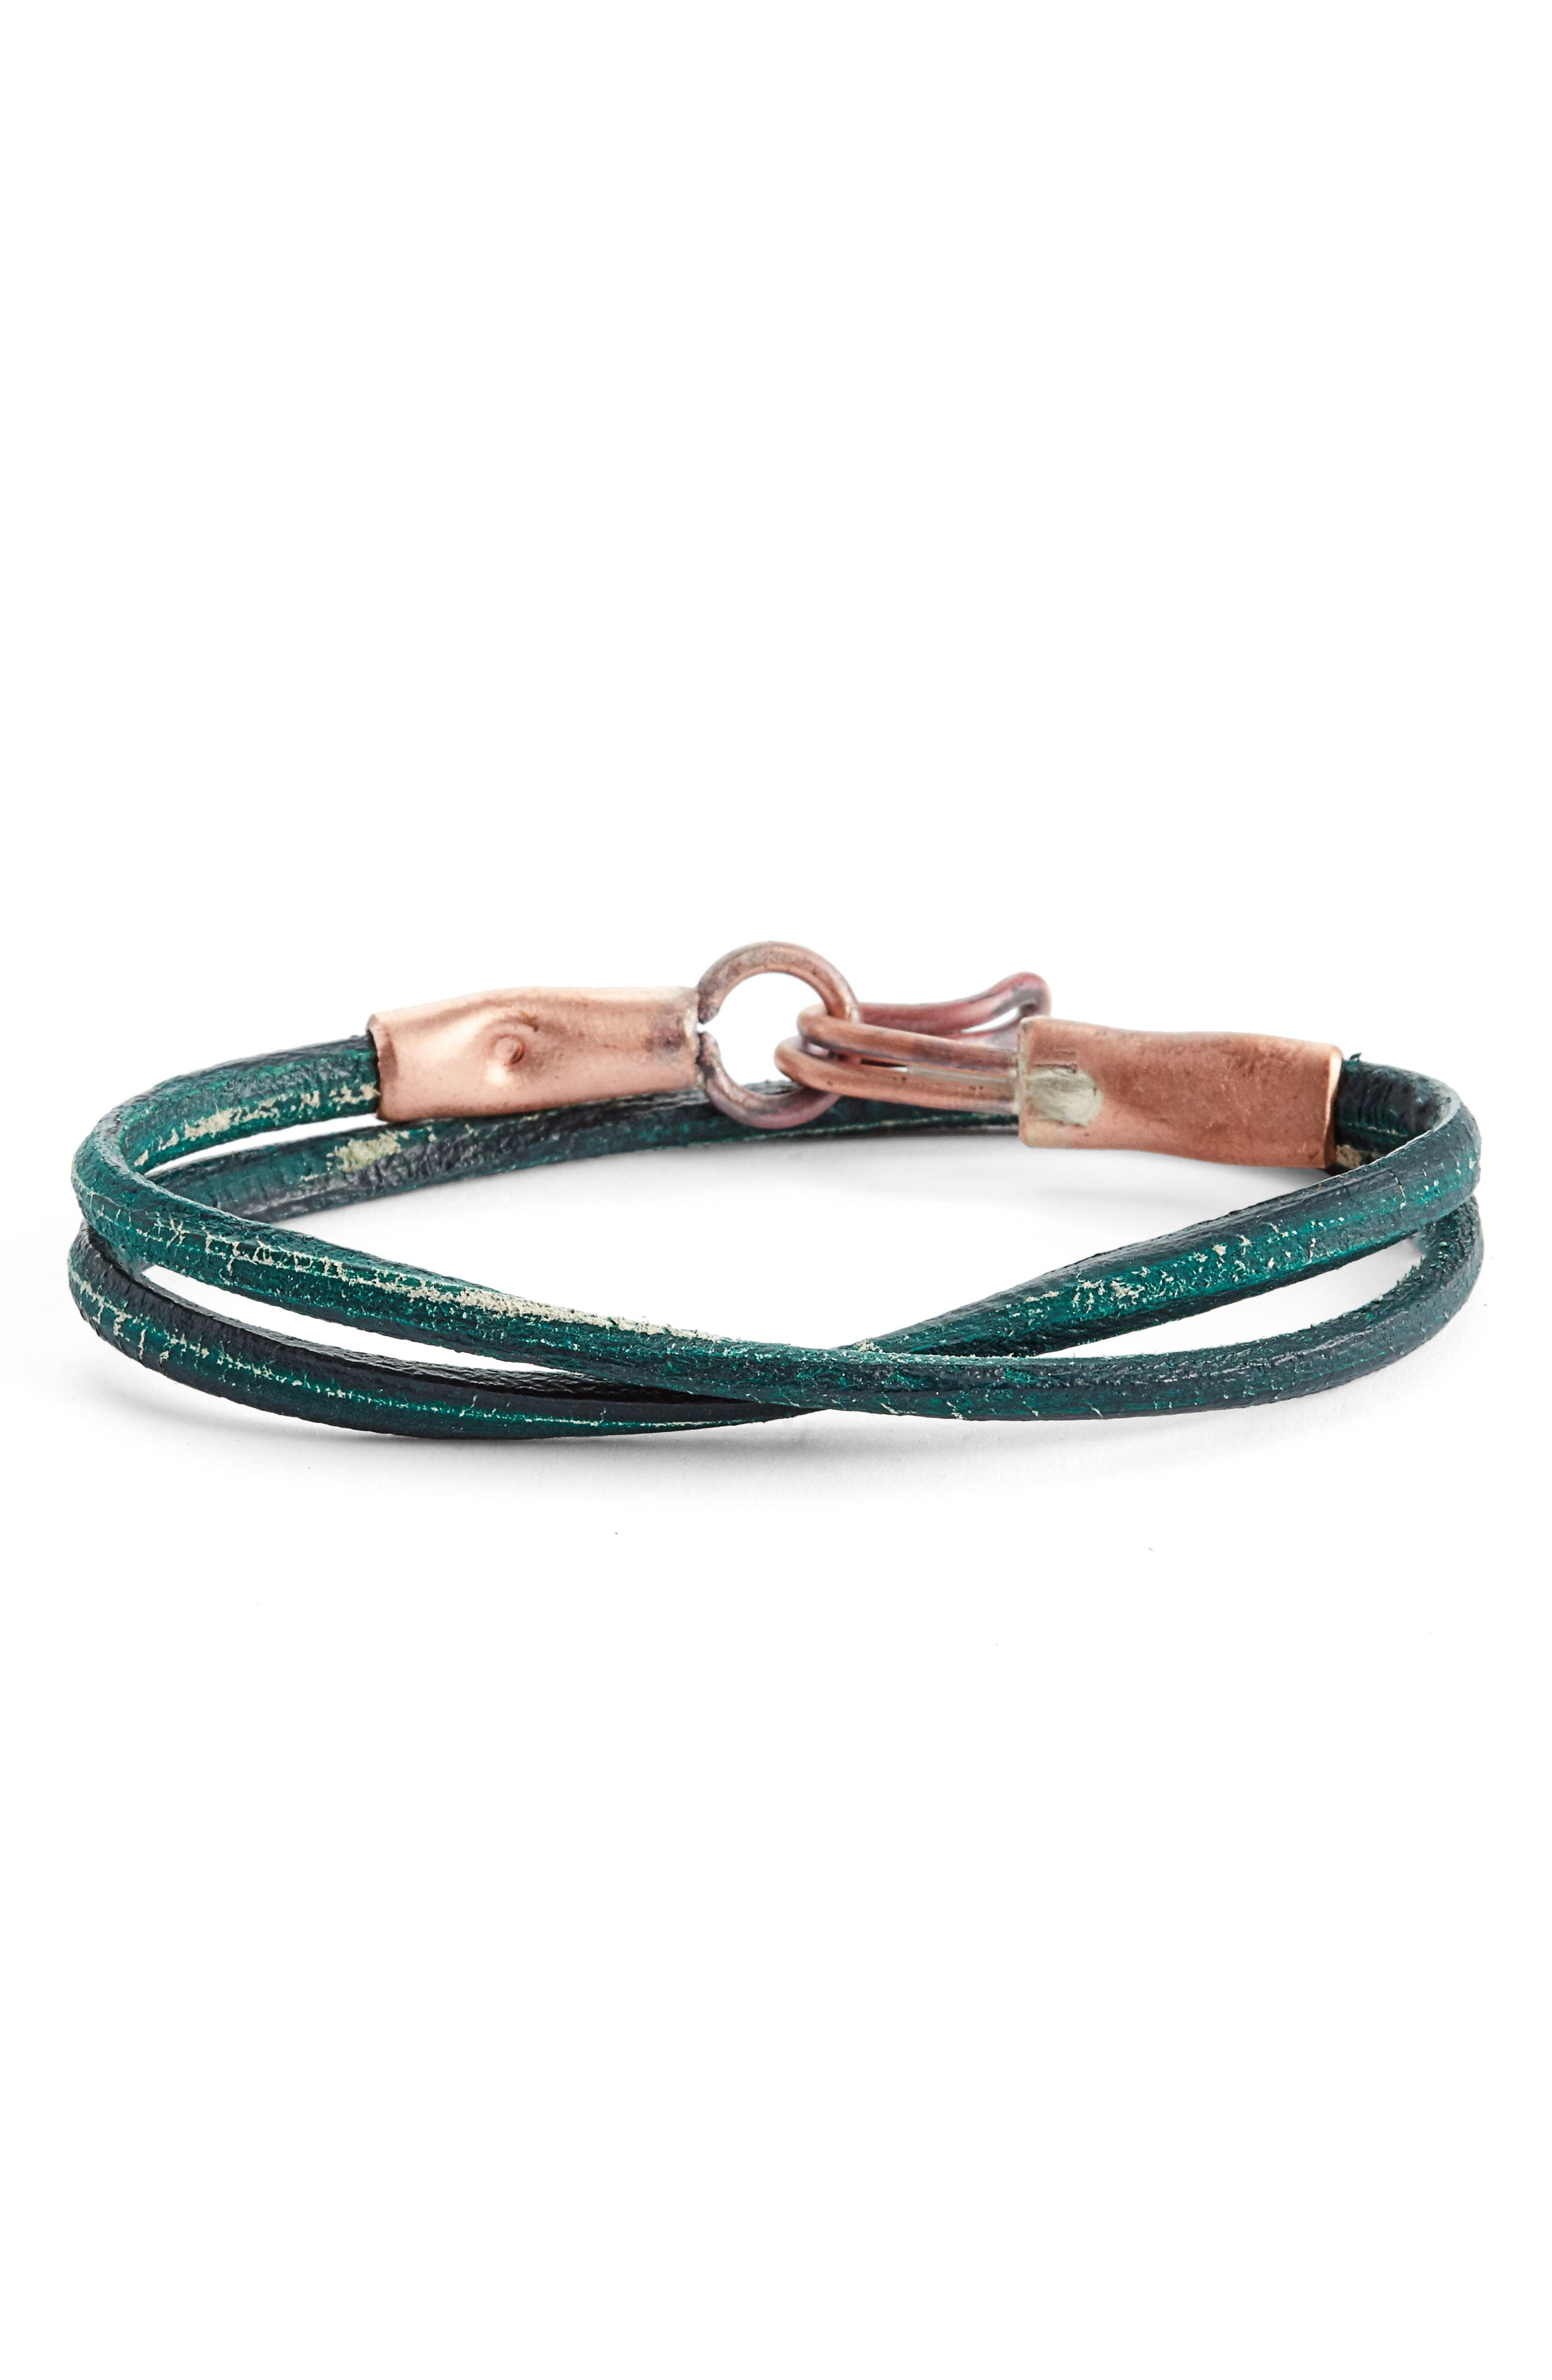 Cause & Effect Leather Wrap Bracelet,                             Main thumbnail 1, color,                             Green